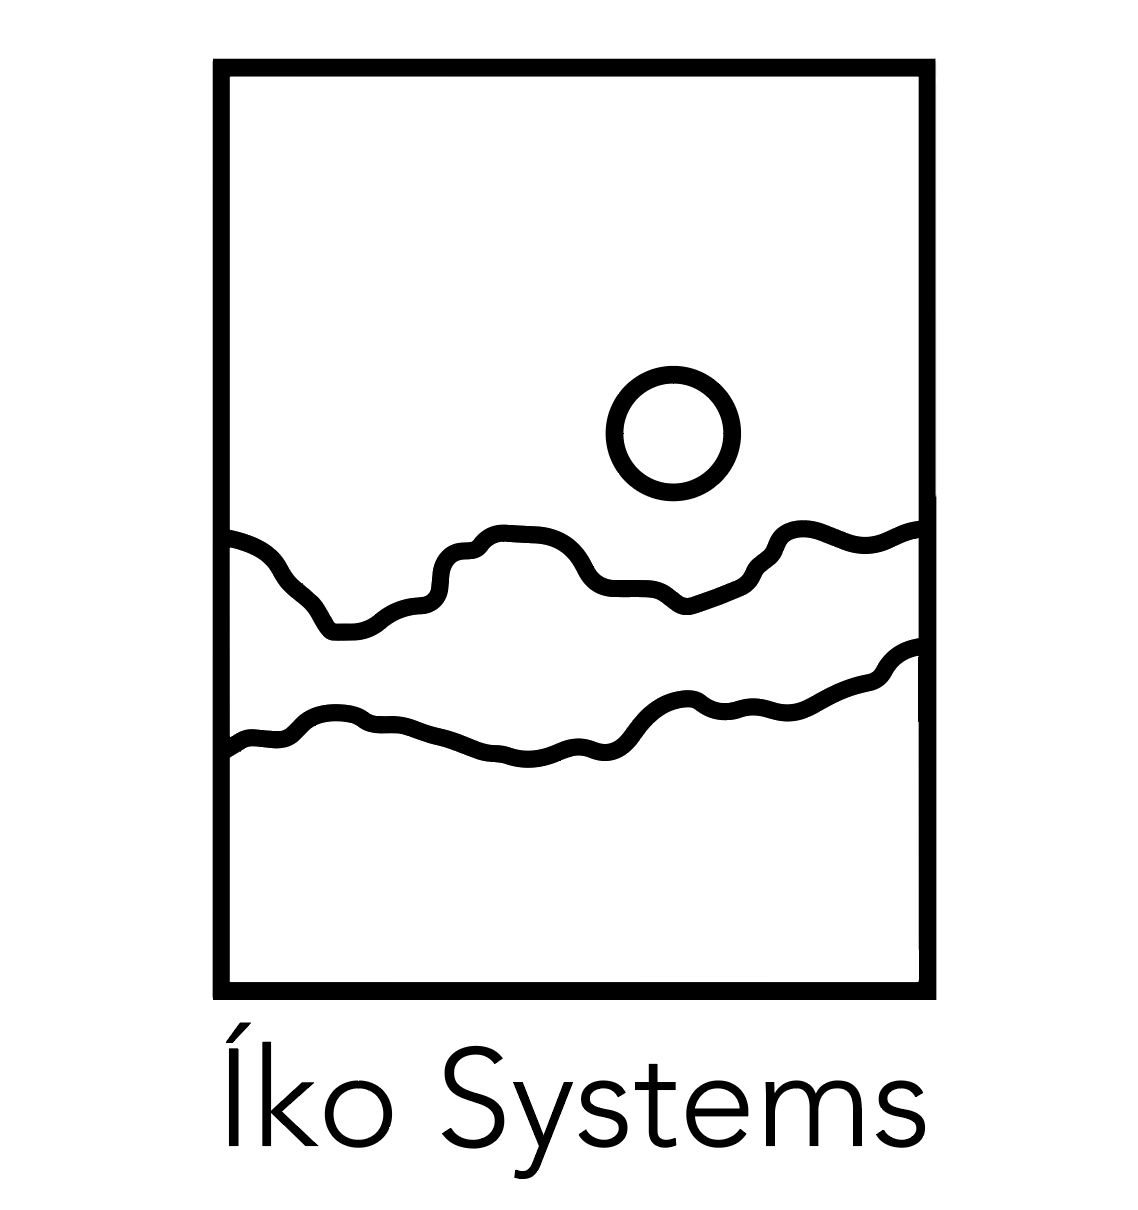 Íko Systems